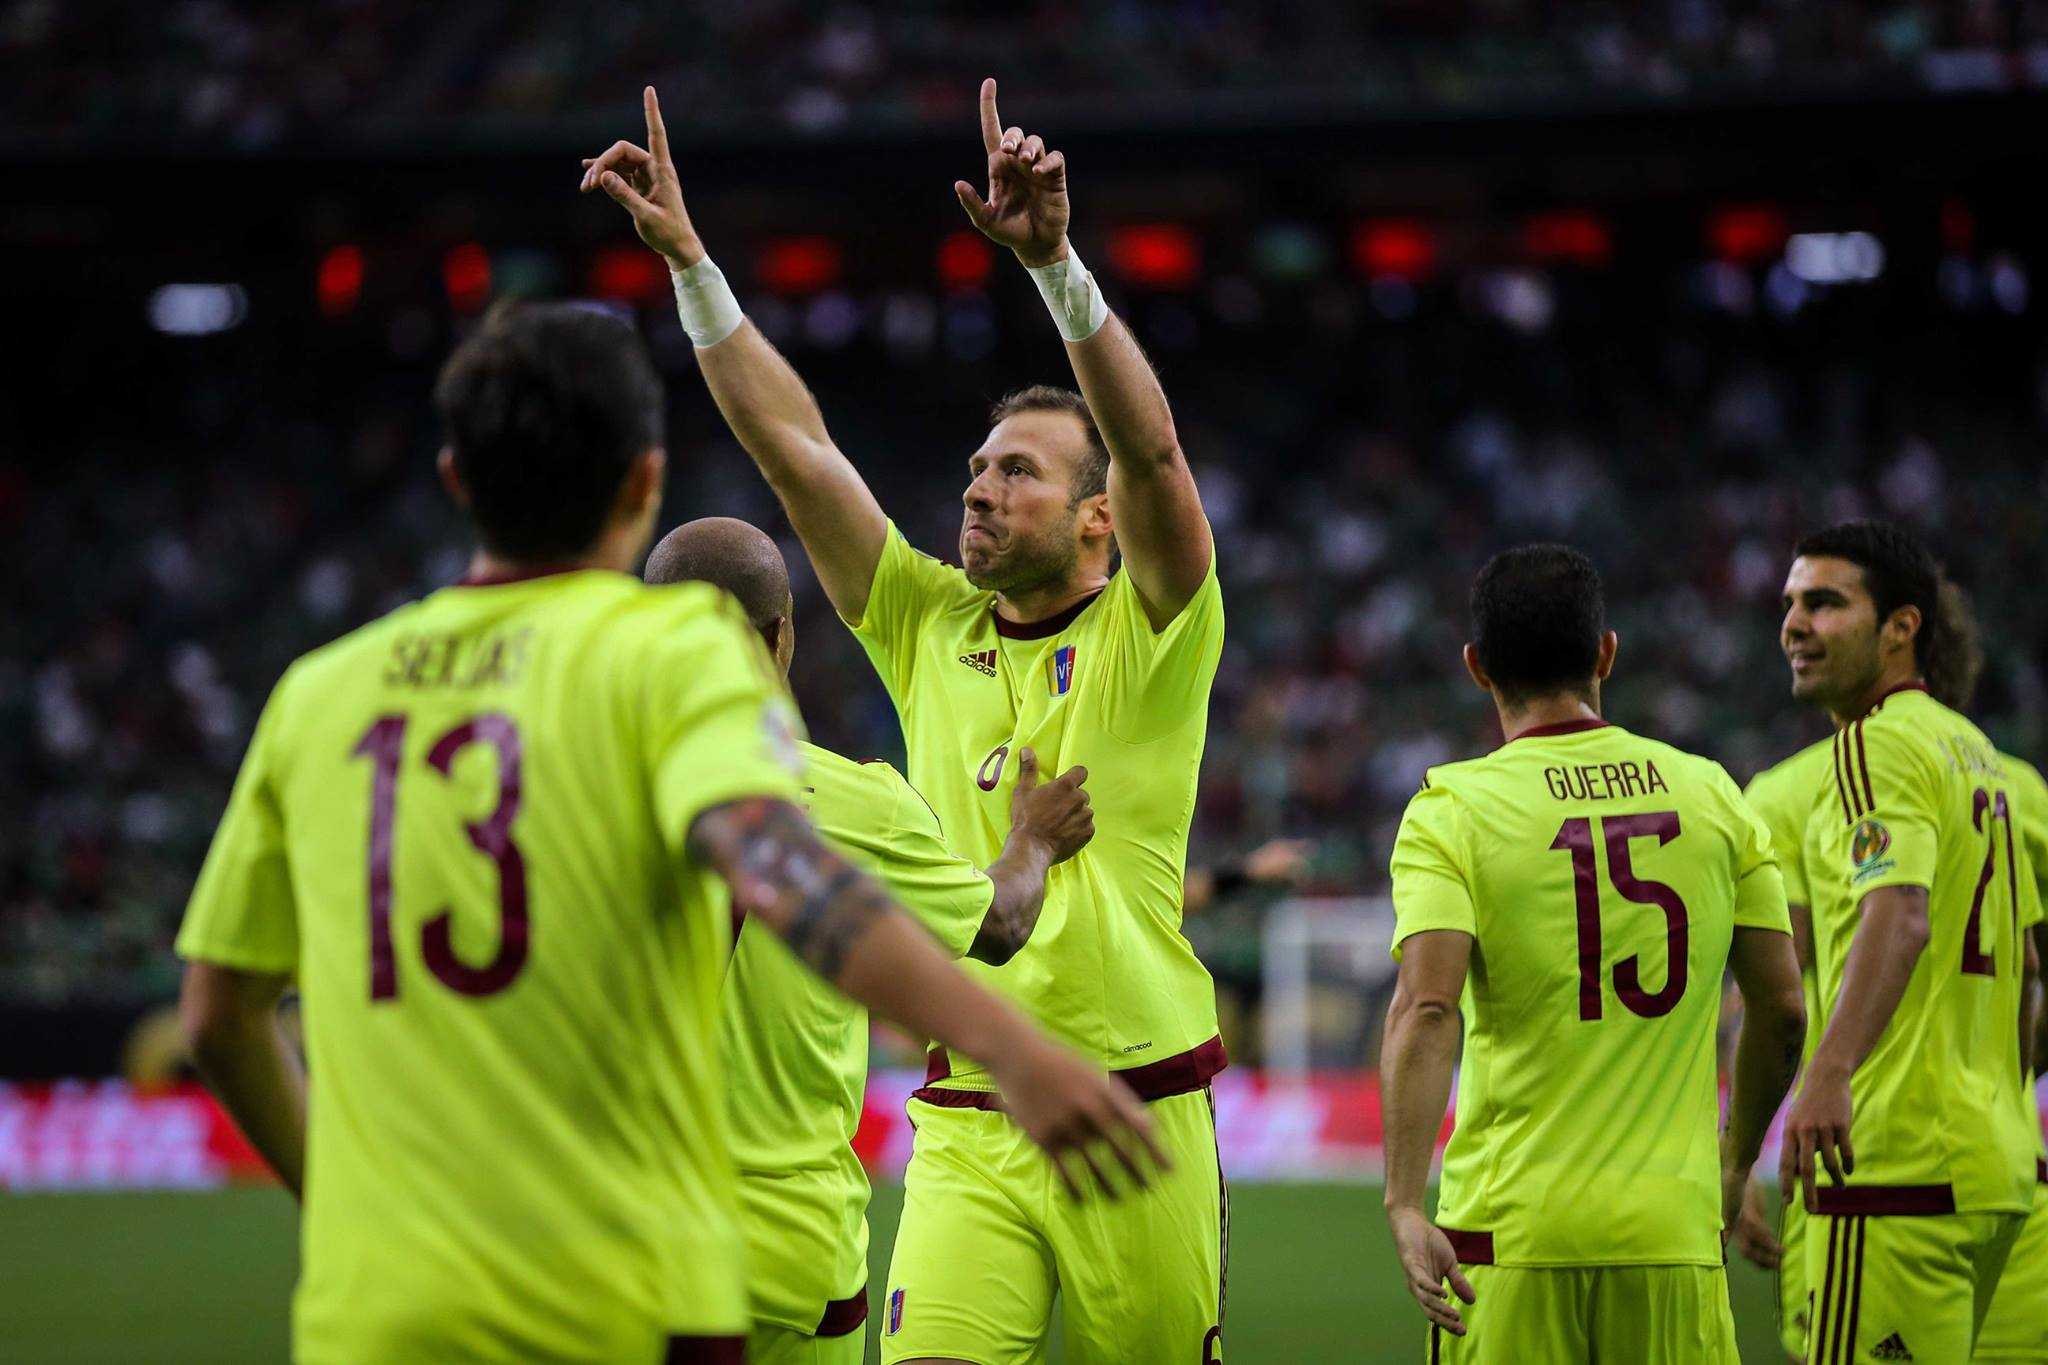 'Sema' celebra el momentáneo 1-0 ante México. foto prensa FVF